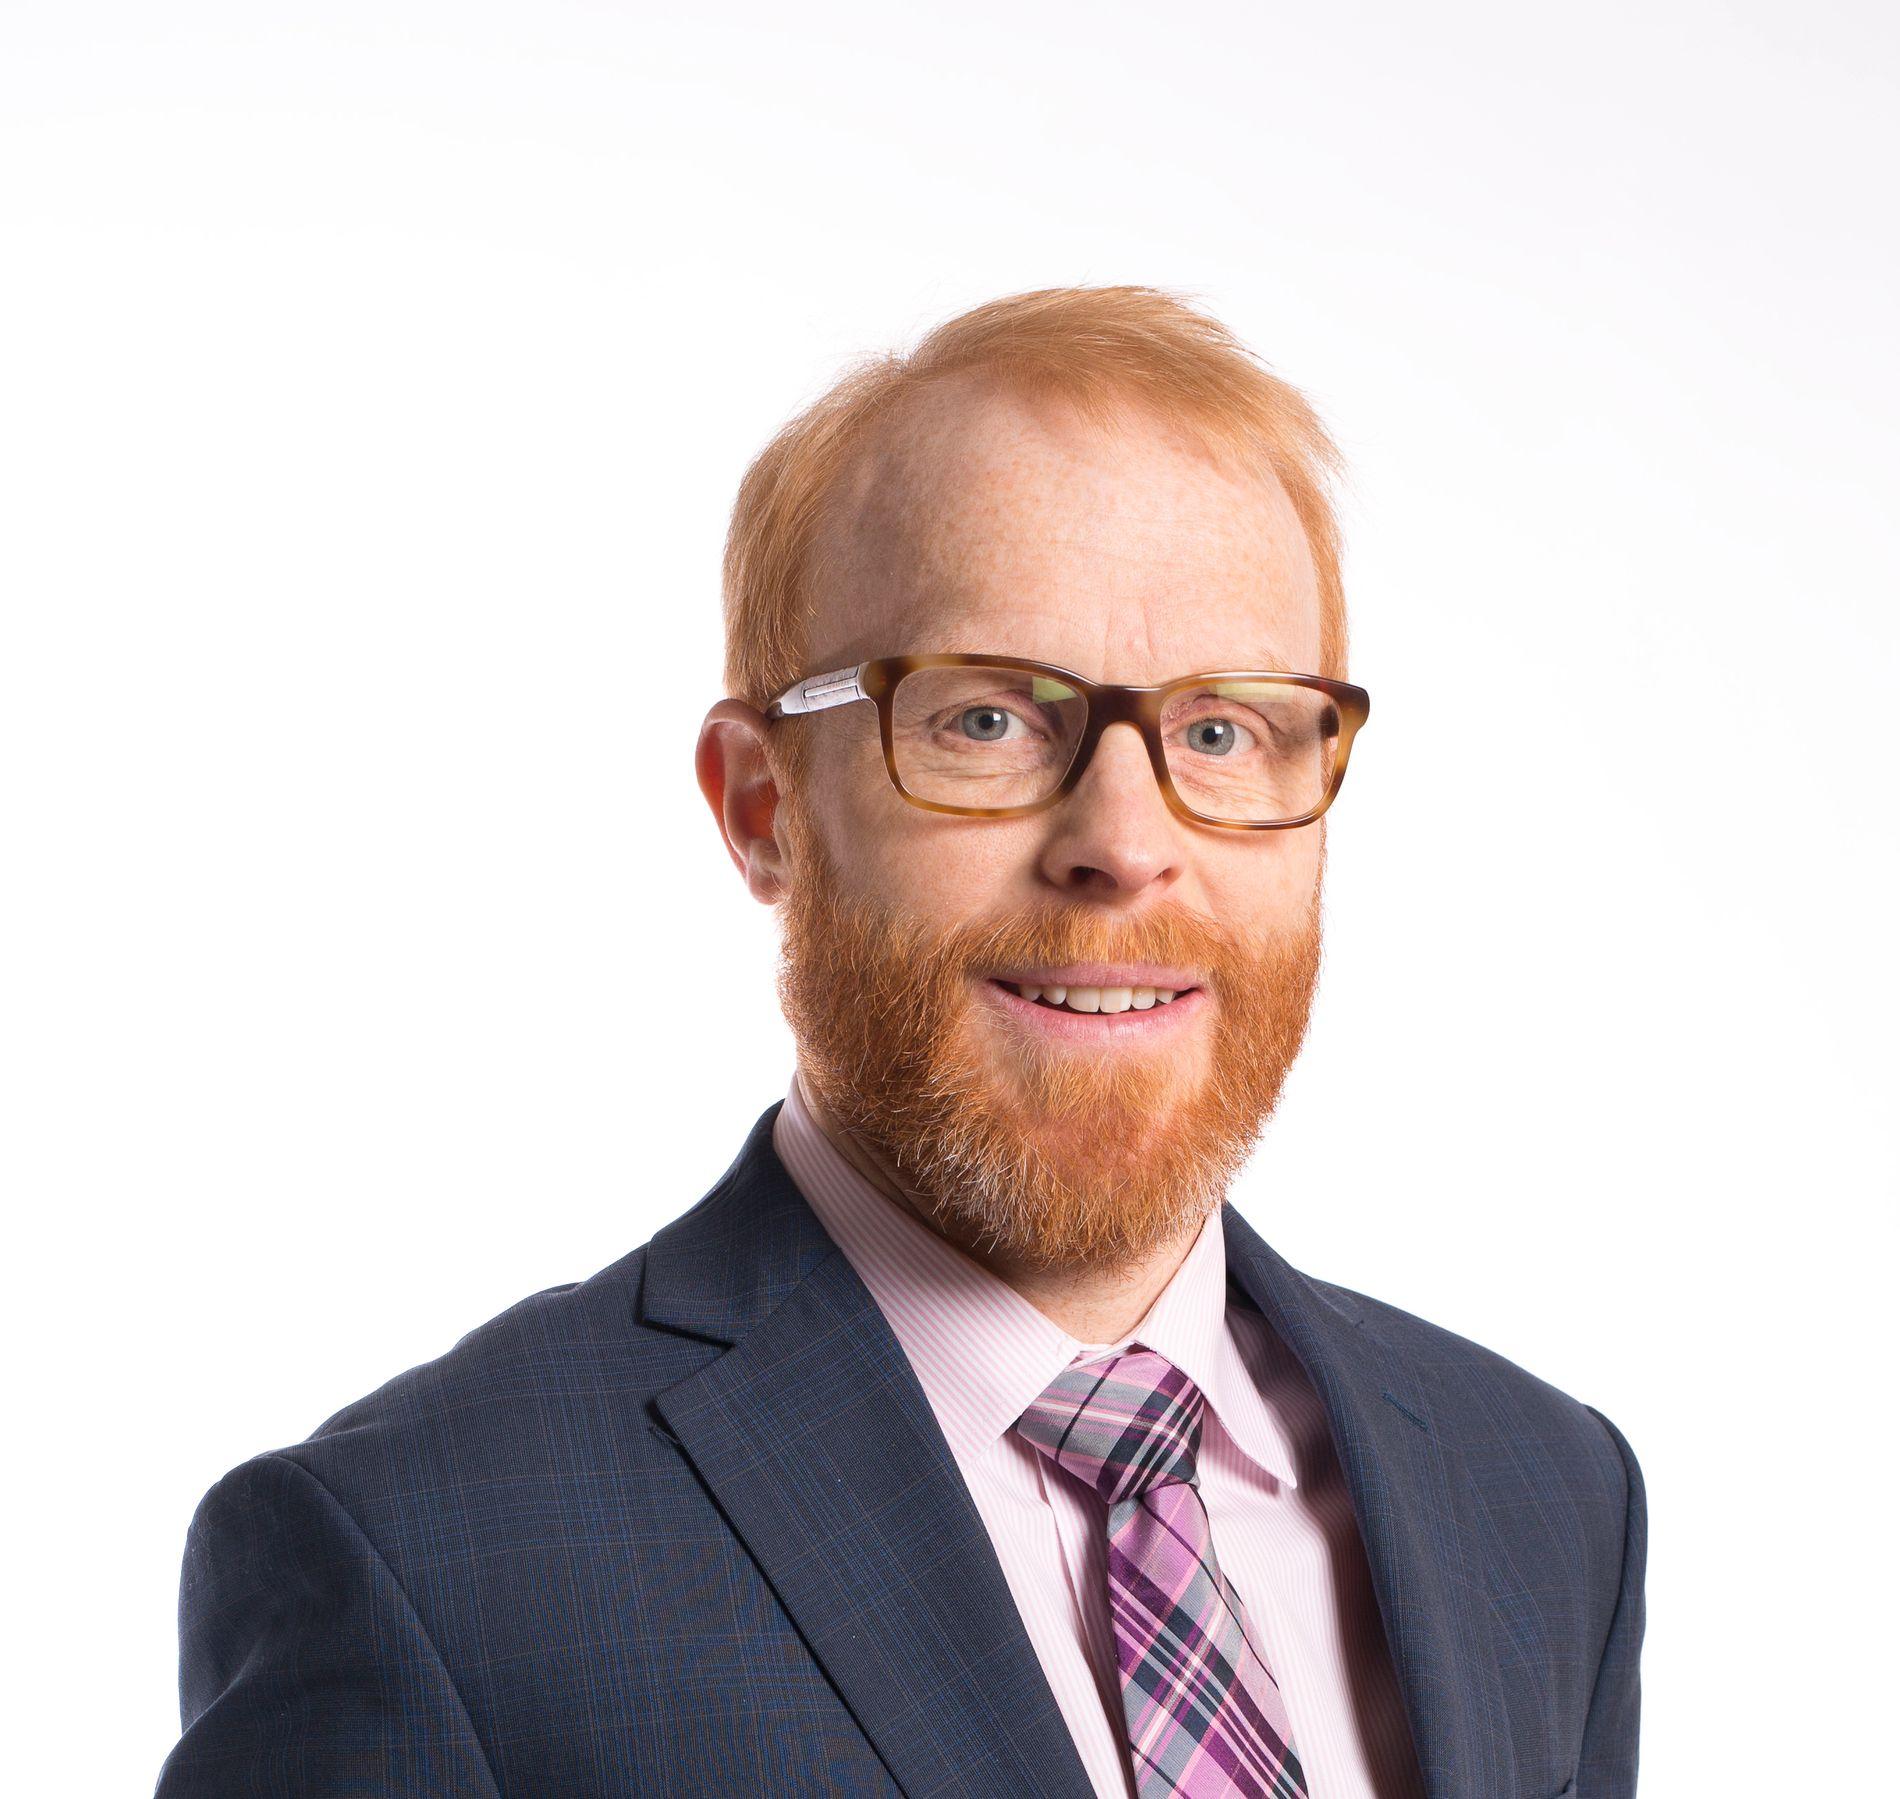 NEI TIL PRISKONTROLL: Kjetil Storesletten er professor ved Økonomisk institutt ved UiO og sitter i Norges Banks hovedstyre.